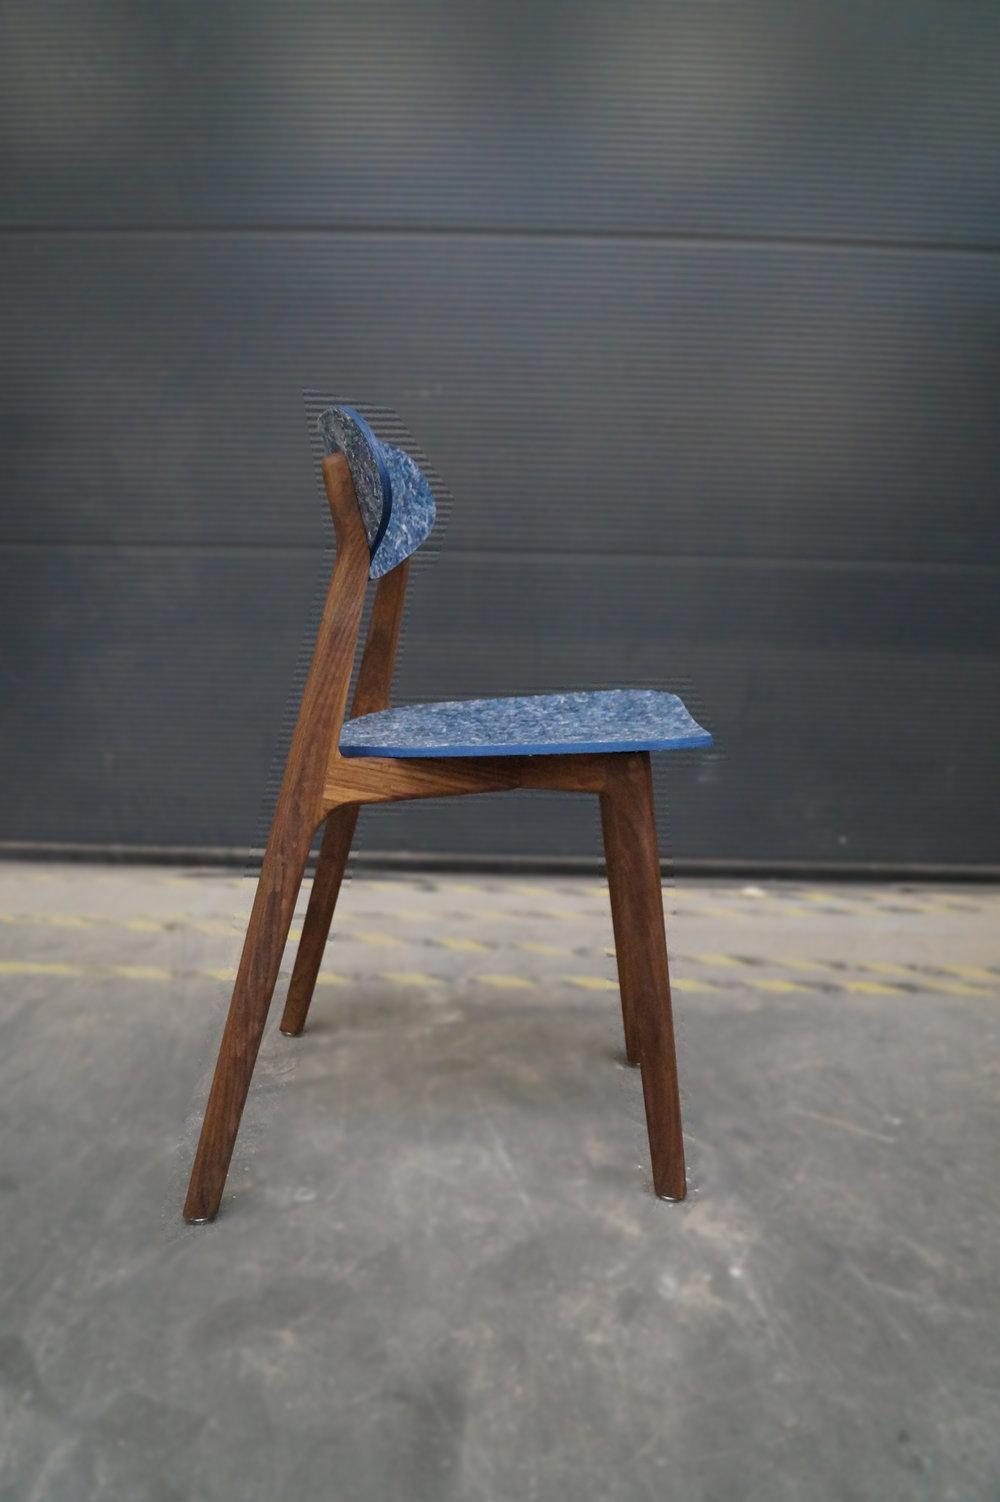 Ubu_Chair_Right_01.jpg